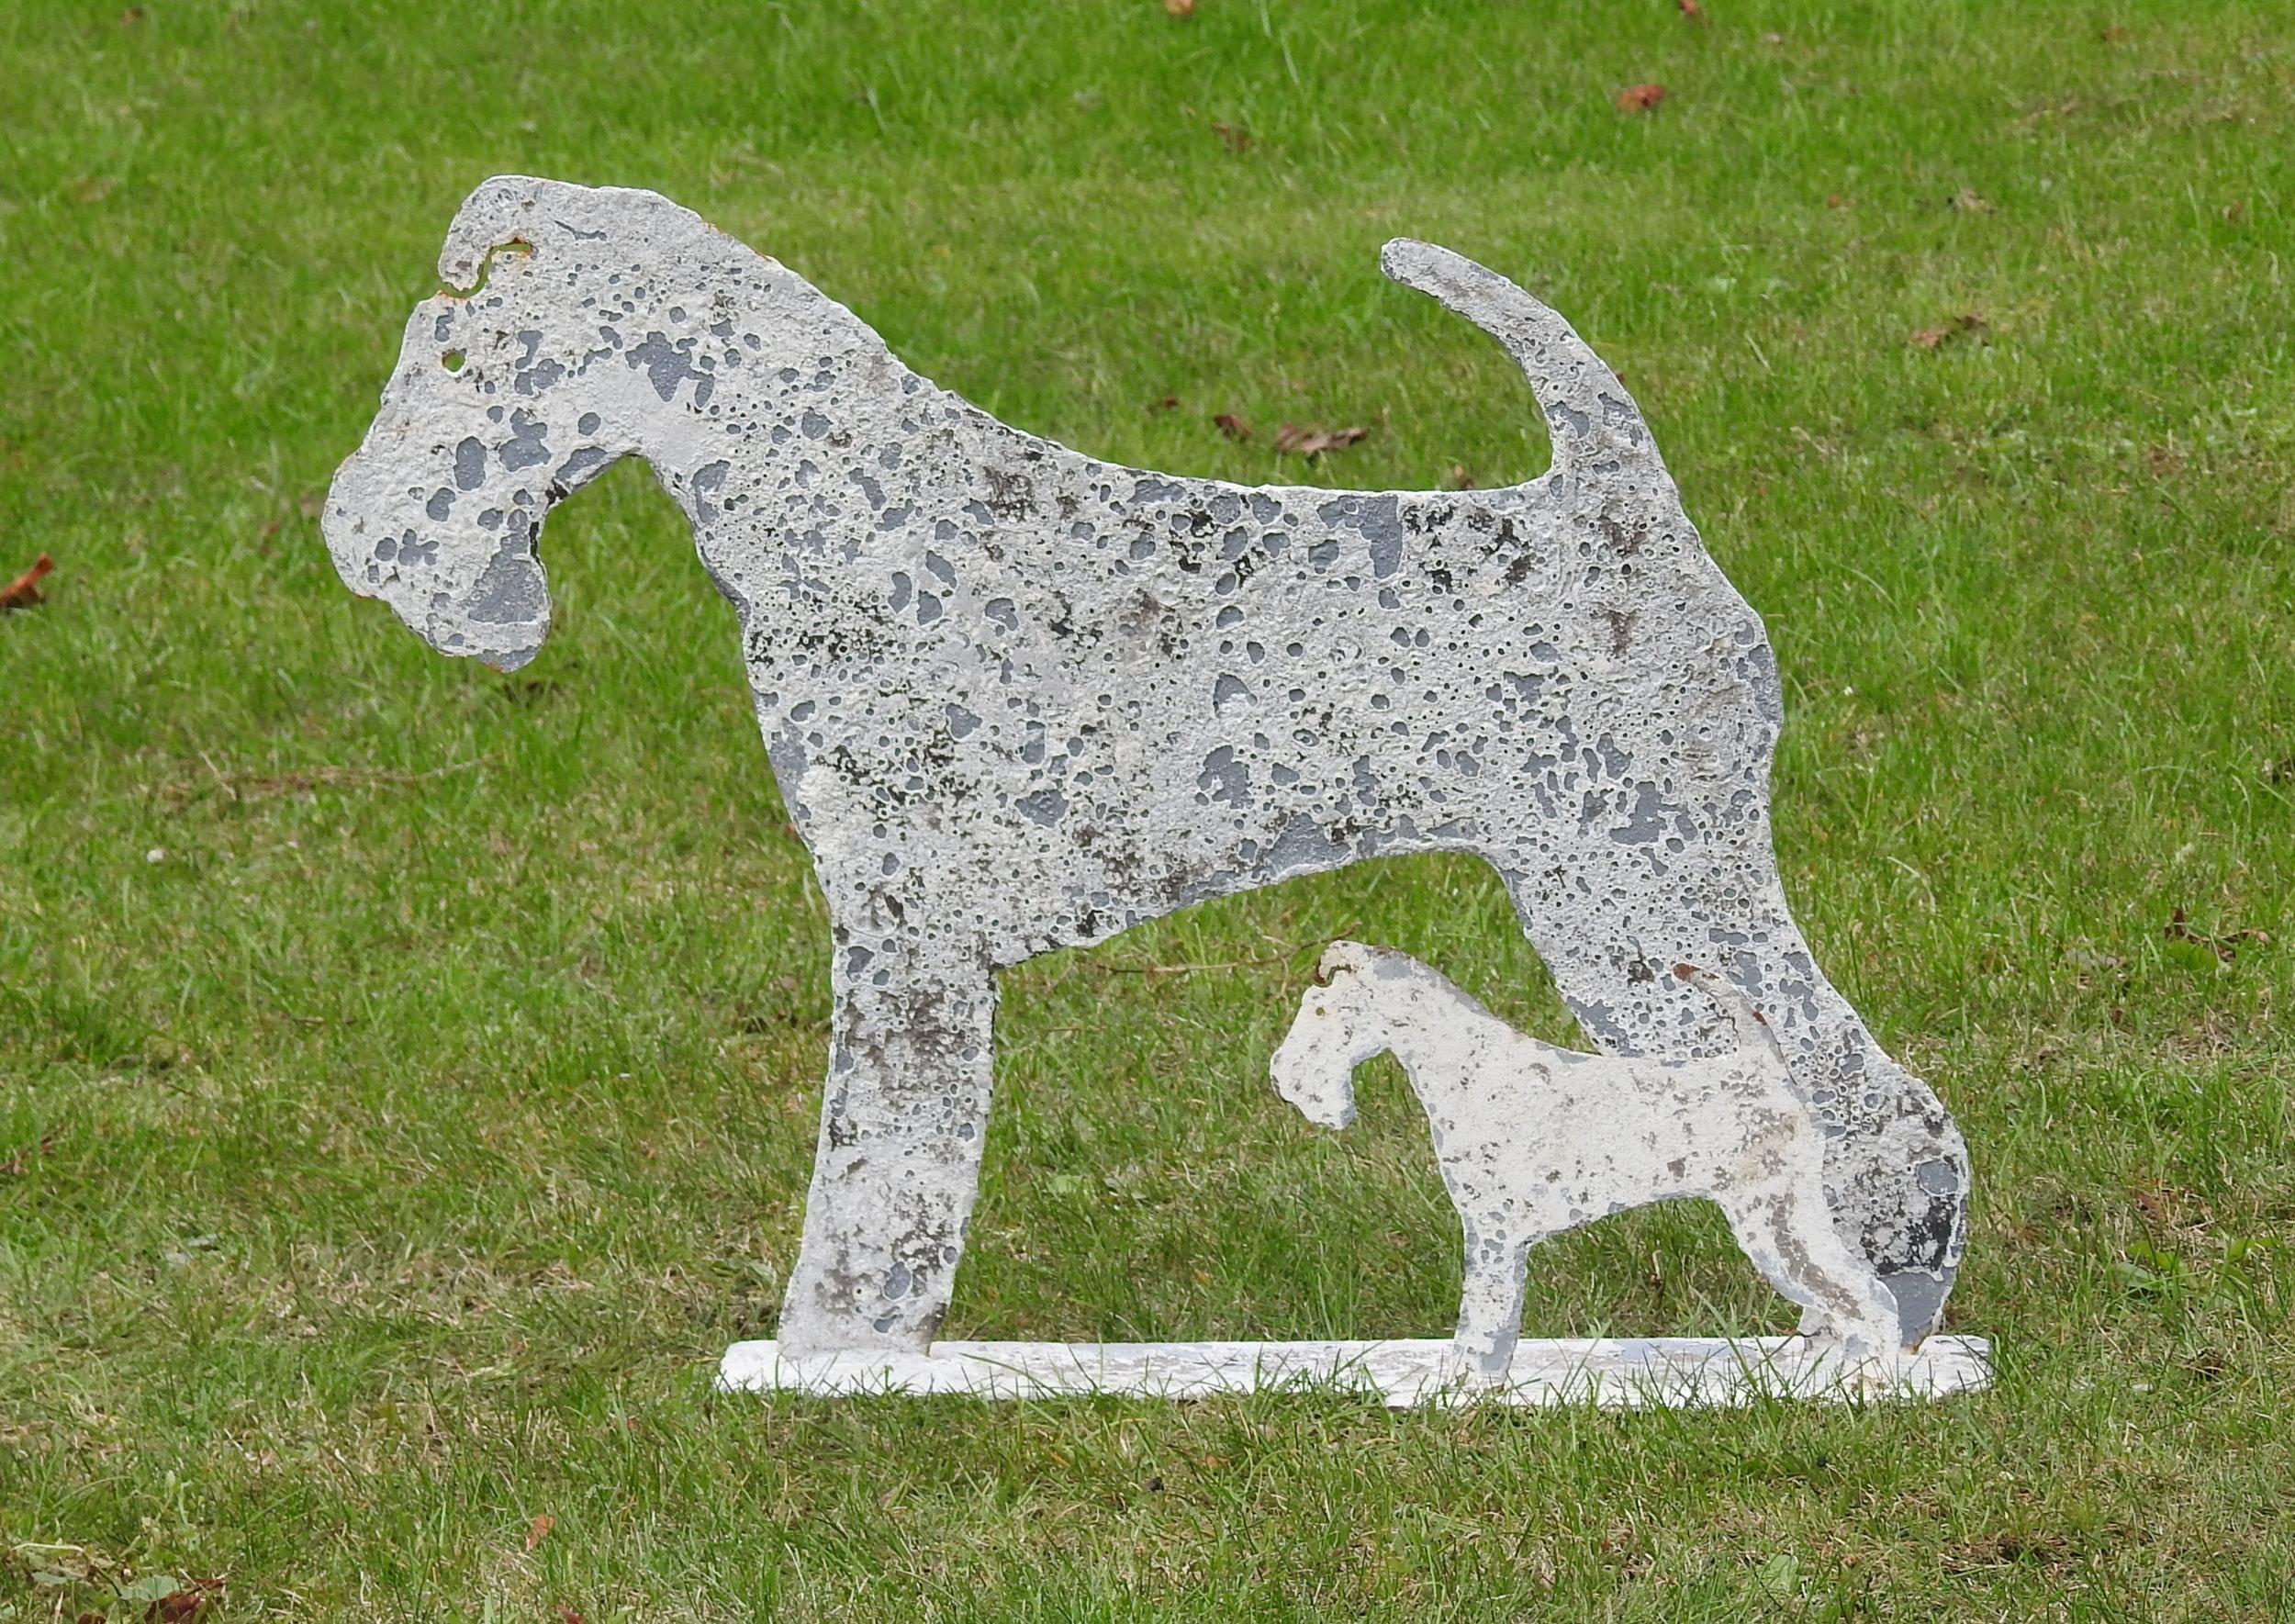 Fox Terrier - £95 & £32 - Lifesize: 55 x 41cmMini: 21 x 16cm